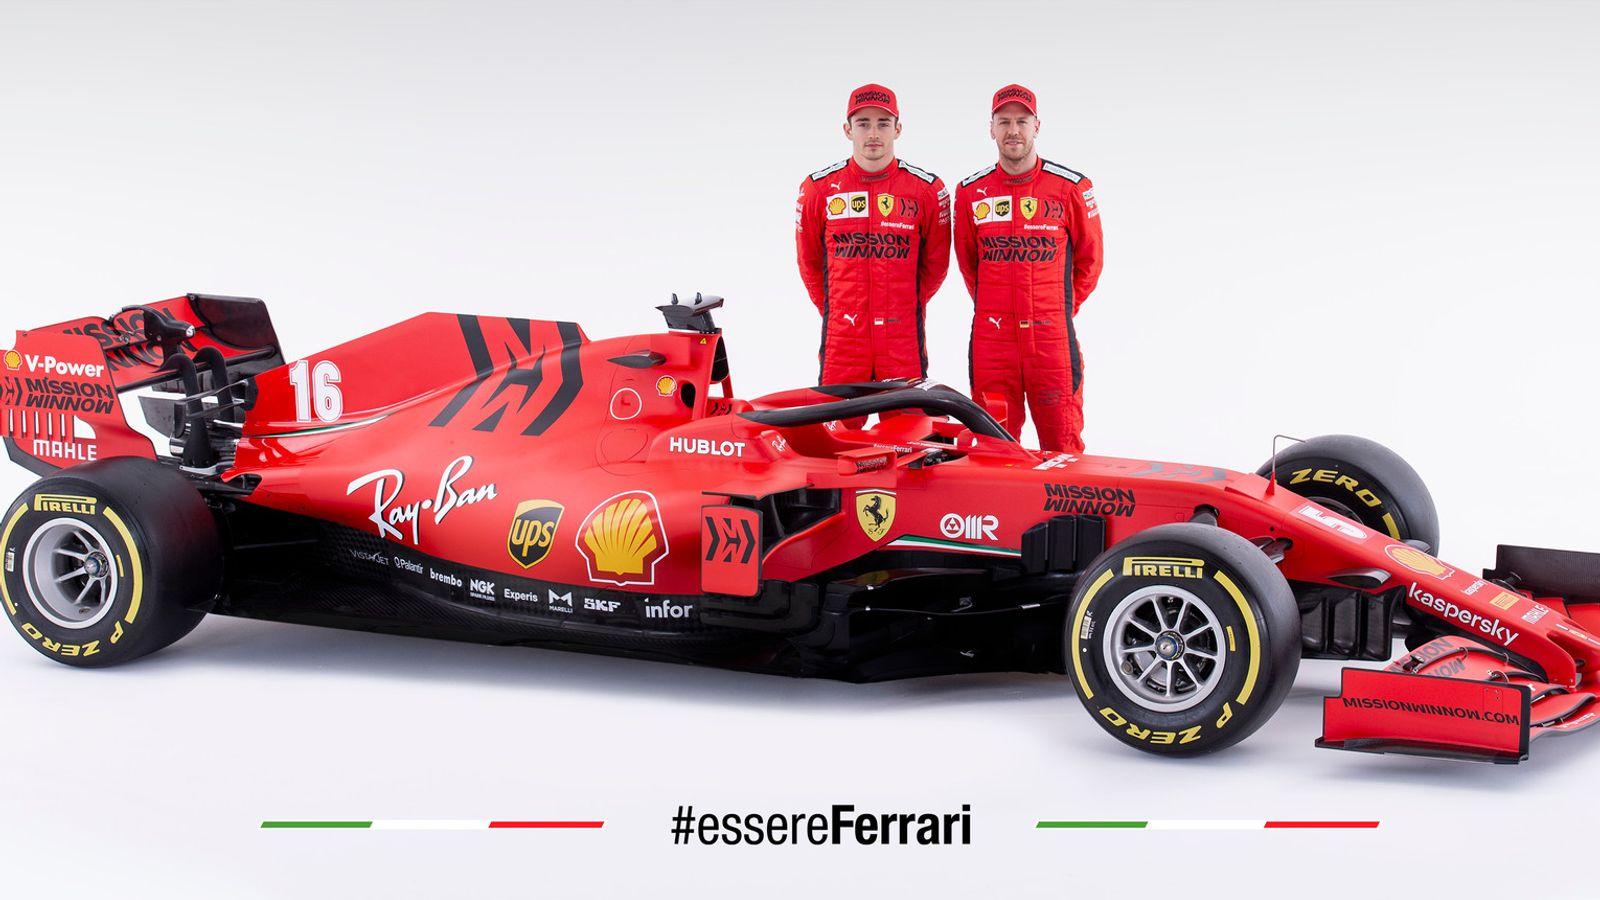 Ferrari unveil 2020 F1 car in dramatic style at SF1000 launch